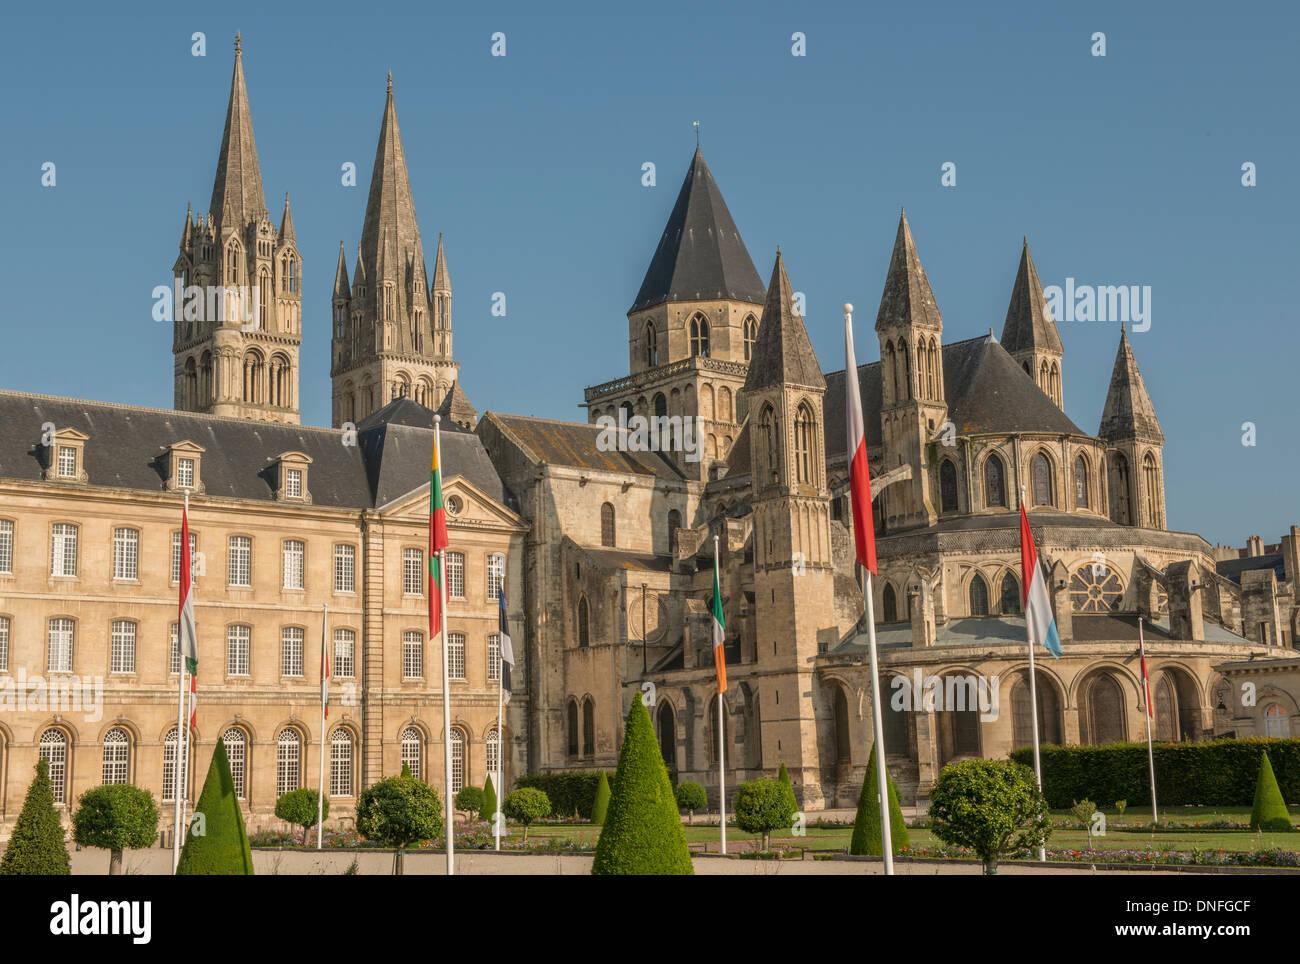 Cabinet D Architecte Caen hotel de ville and abbey of st etienne in caen in the